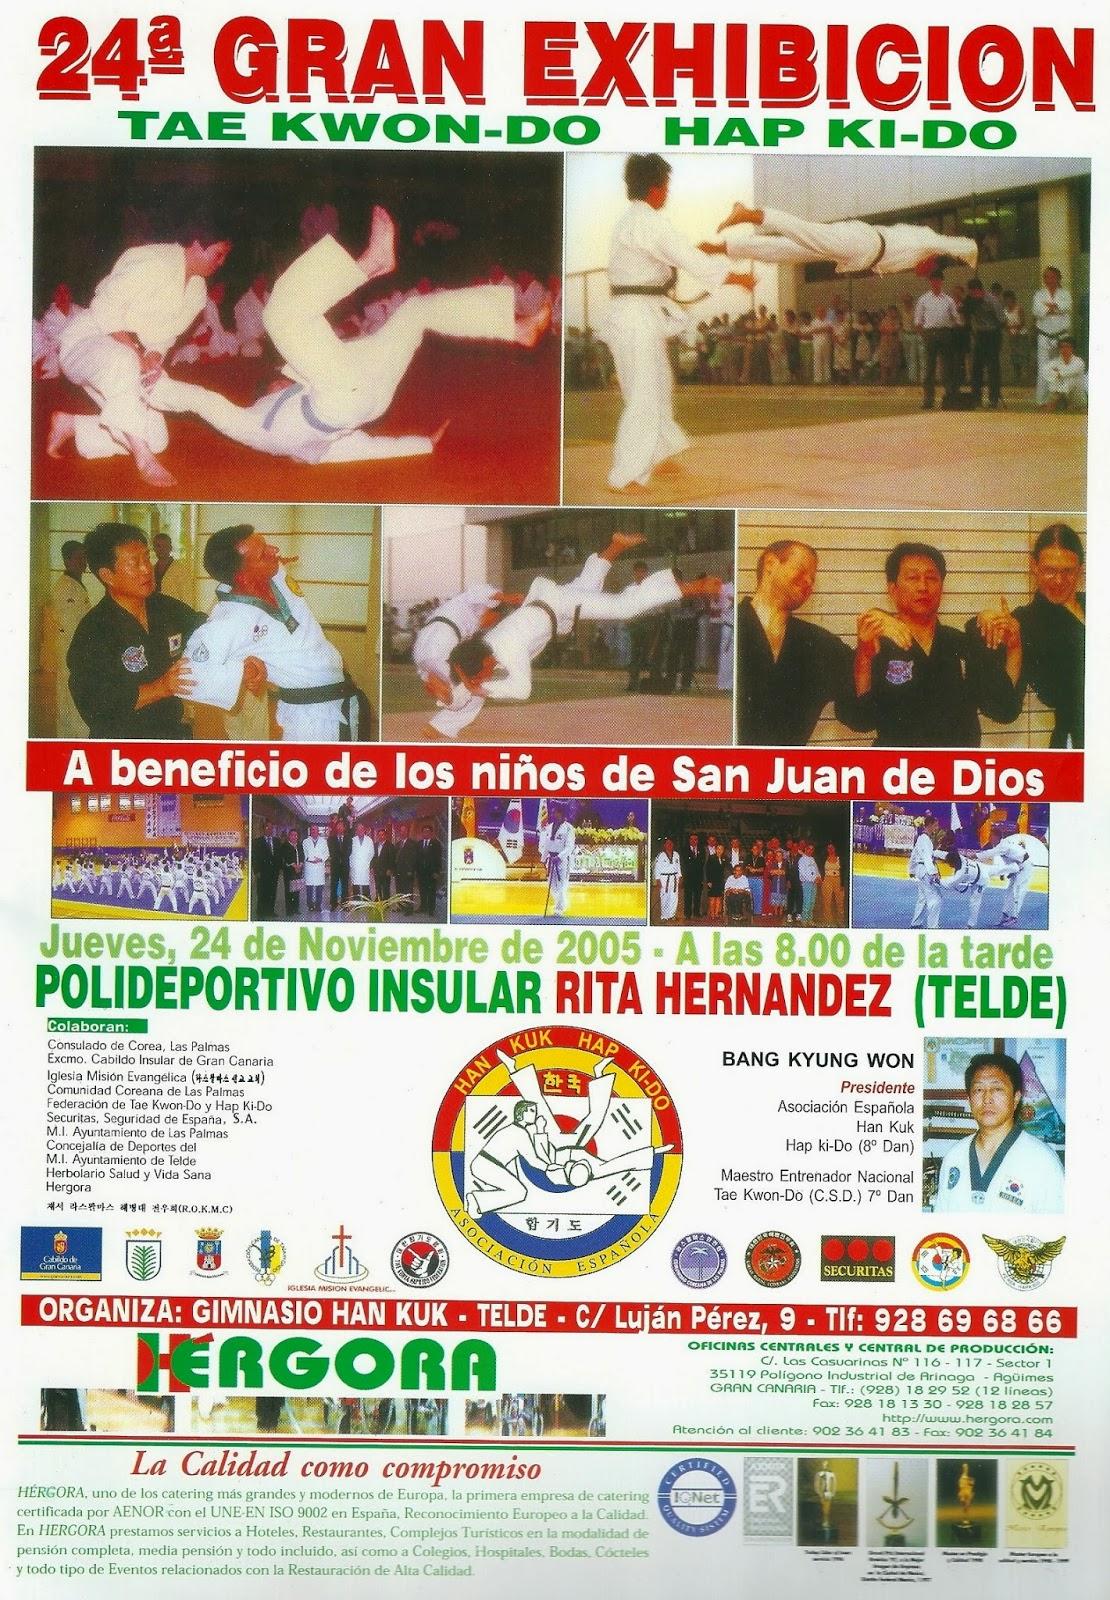 Gimnasio han kuk hapkido taekwondo a o 2005 presentaci n for Gimnasio telde